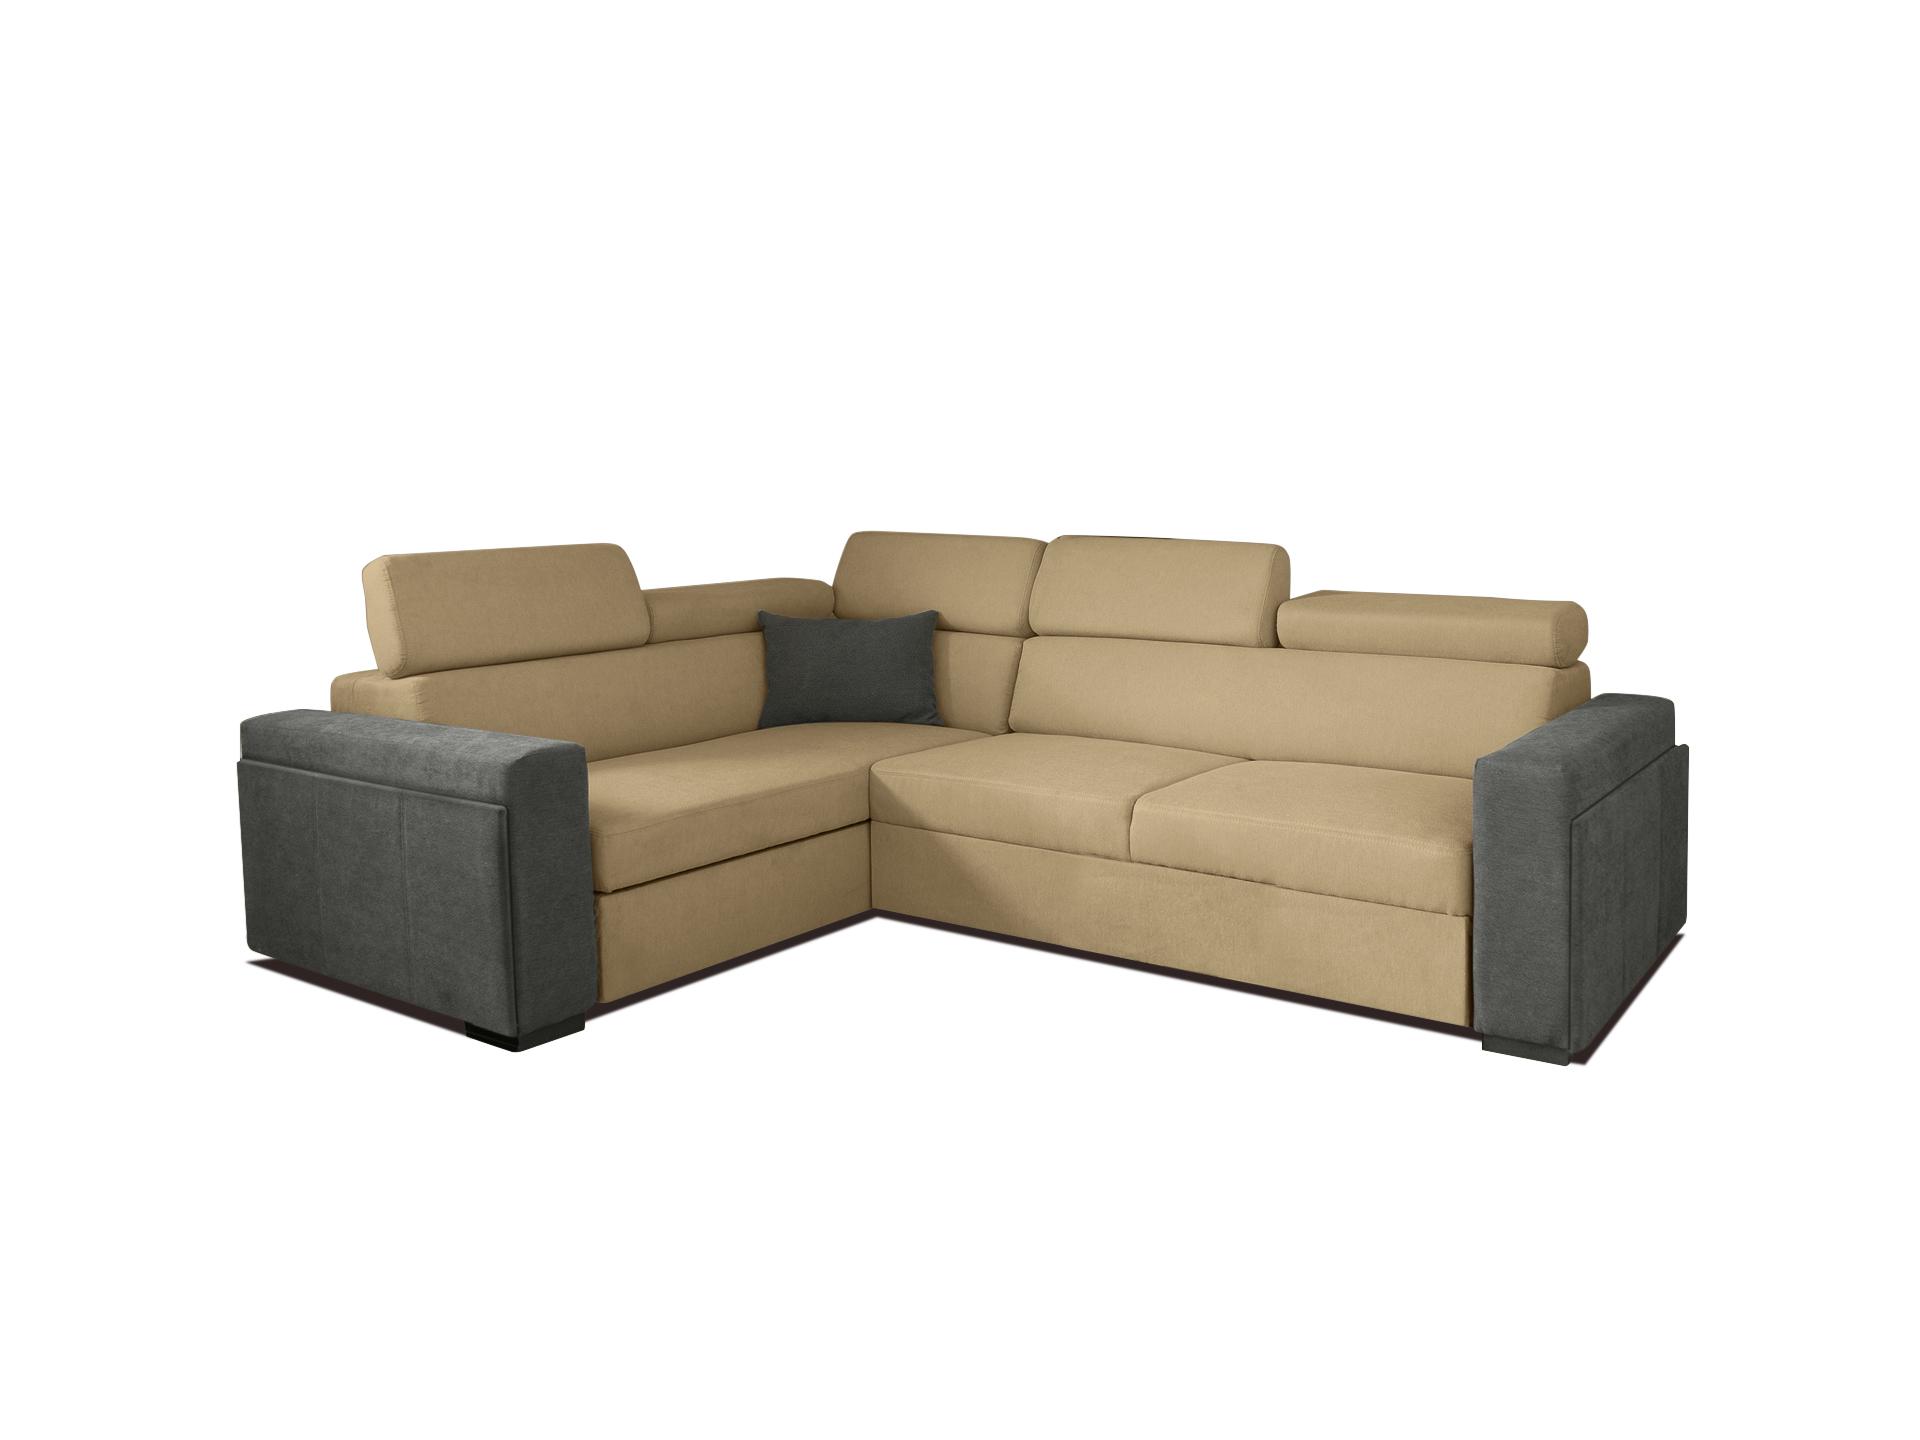 Full Size of Sofa Schlaffunktion Ecksofa Bettfunktion Couch L Textil Garnitur Leder Polyrattan Canape Bezug Halbrund Grün Antik Günstig Kaufen Dreisitzer Mit Hocker Sofa Sofa Schlaffunktion